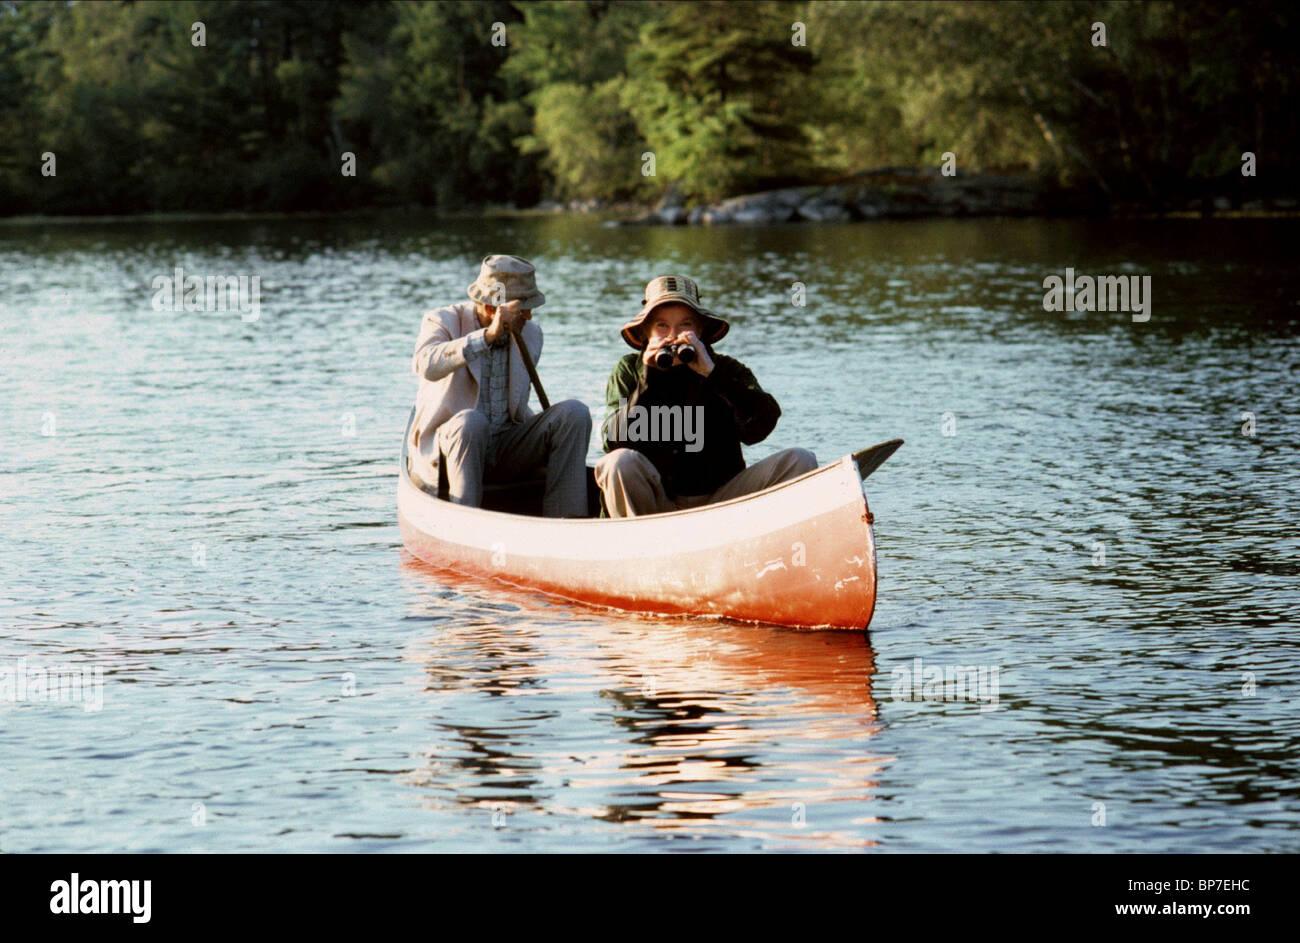 On Golden Pond Quotes On Golden Pond Movie Stock Photos & On Golden Pond Movie Stock